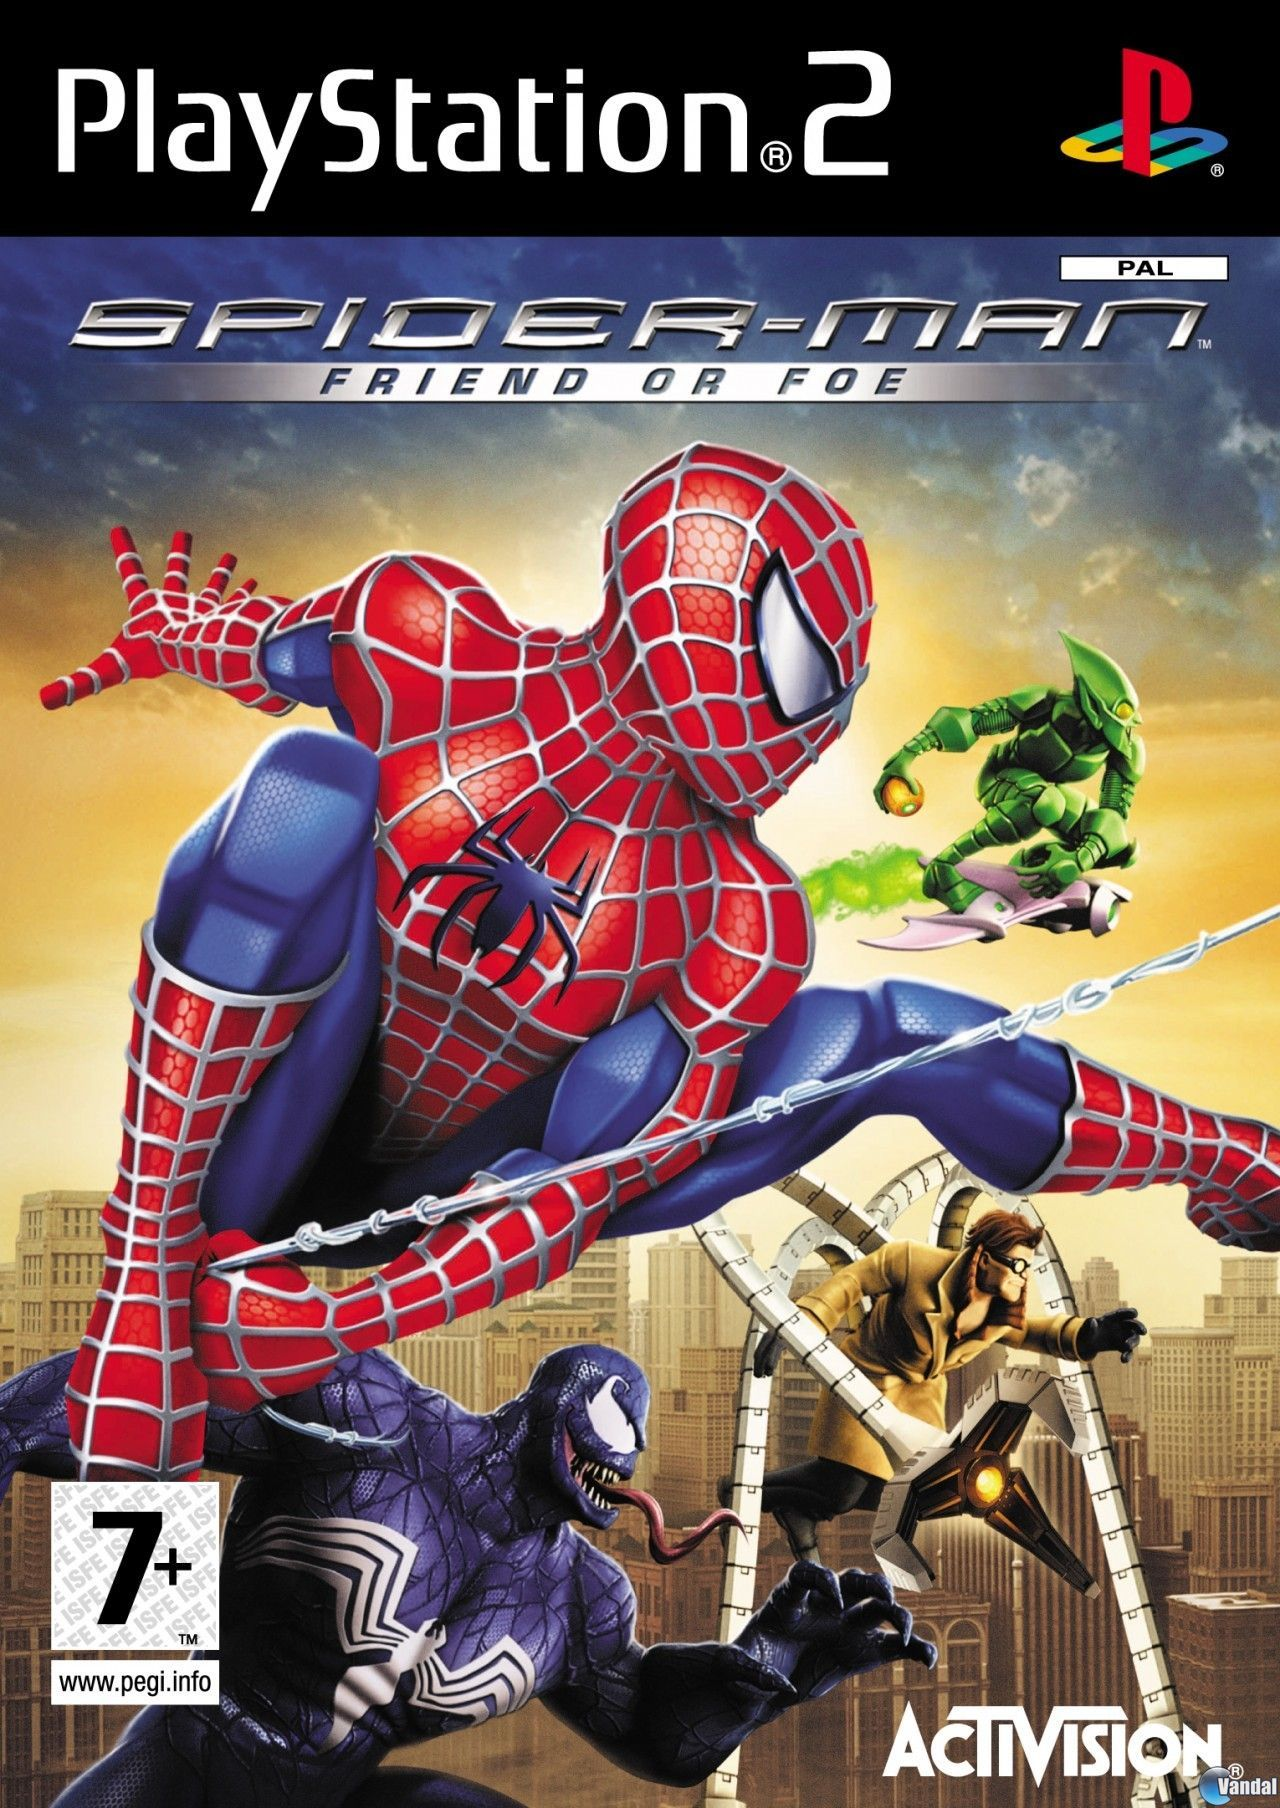 Trucos spiderman friend or foe ps2 claves gu as - Jeux de spiderman 7 ...